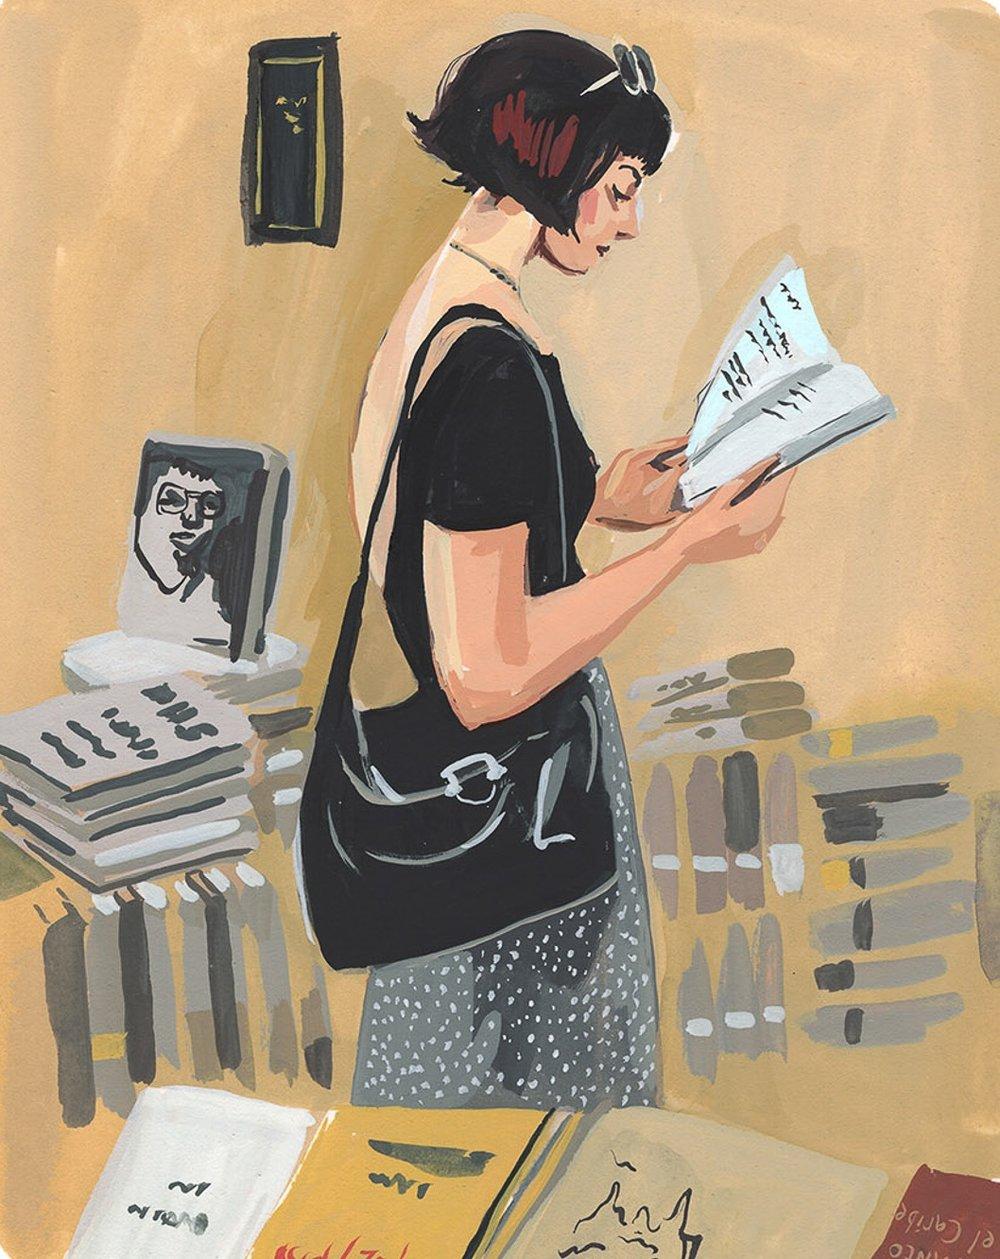 CA 60 2019, SOI 61 2018 - ARTIST: Jenny KroikTITLE: Word Up Books [7 of 7]